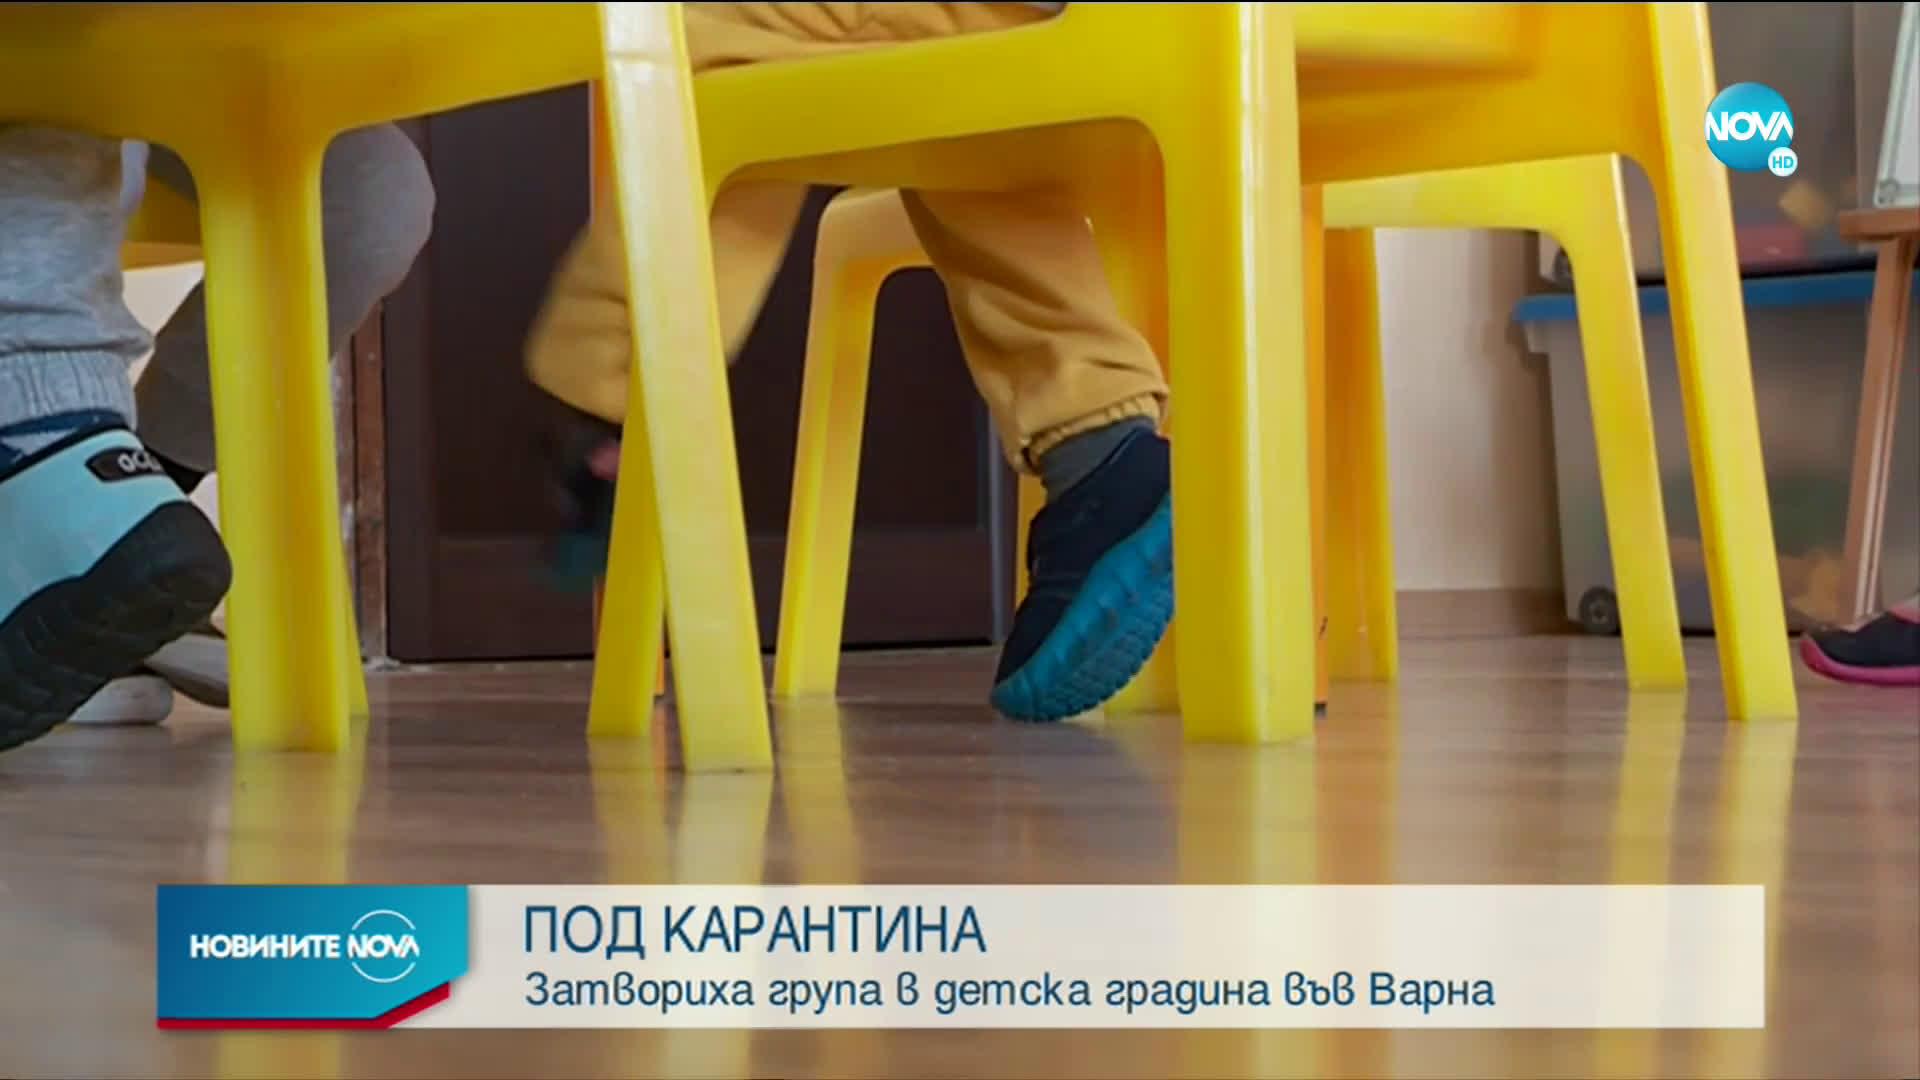 Затвориха група в детска градина във Варна заради COVID-19